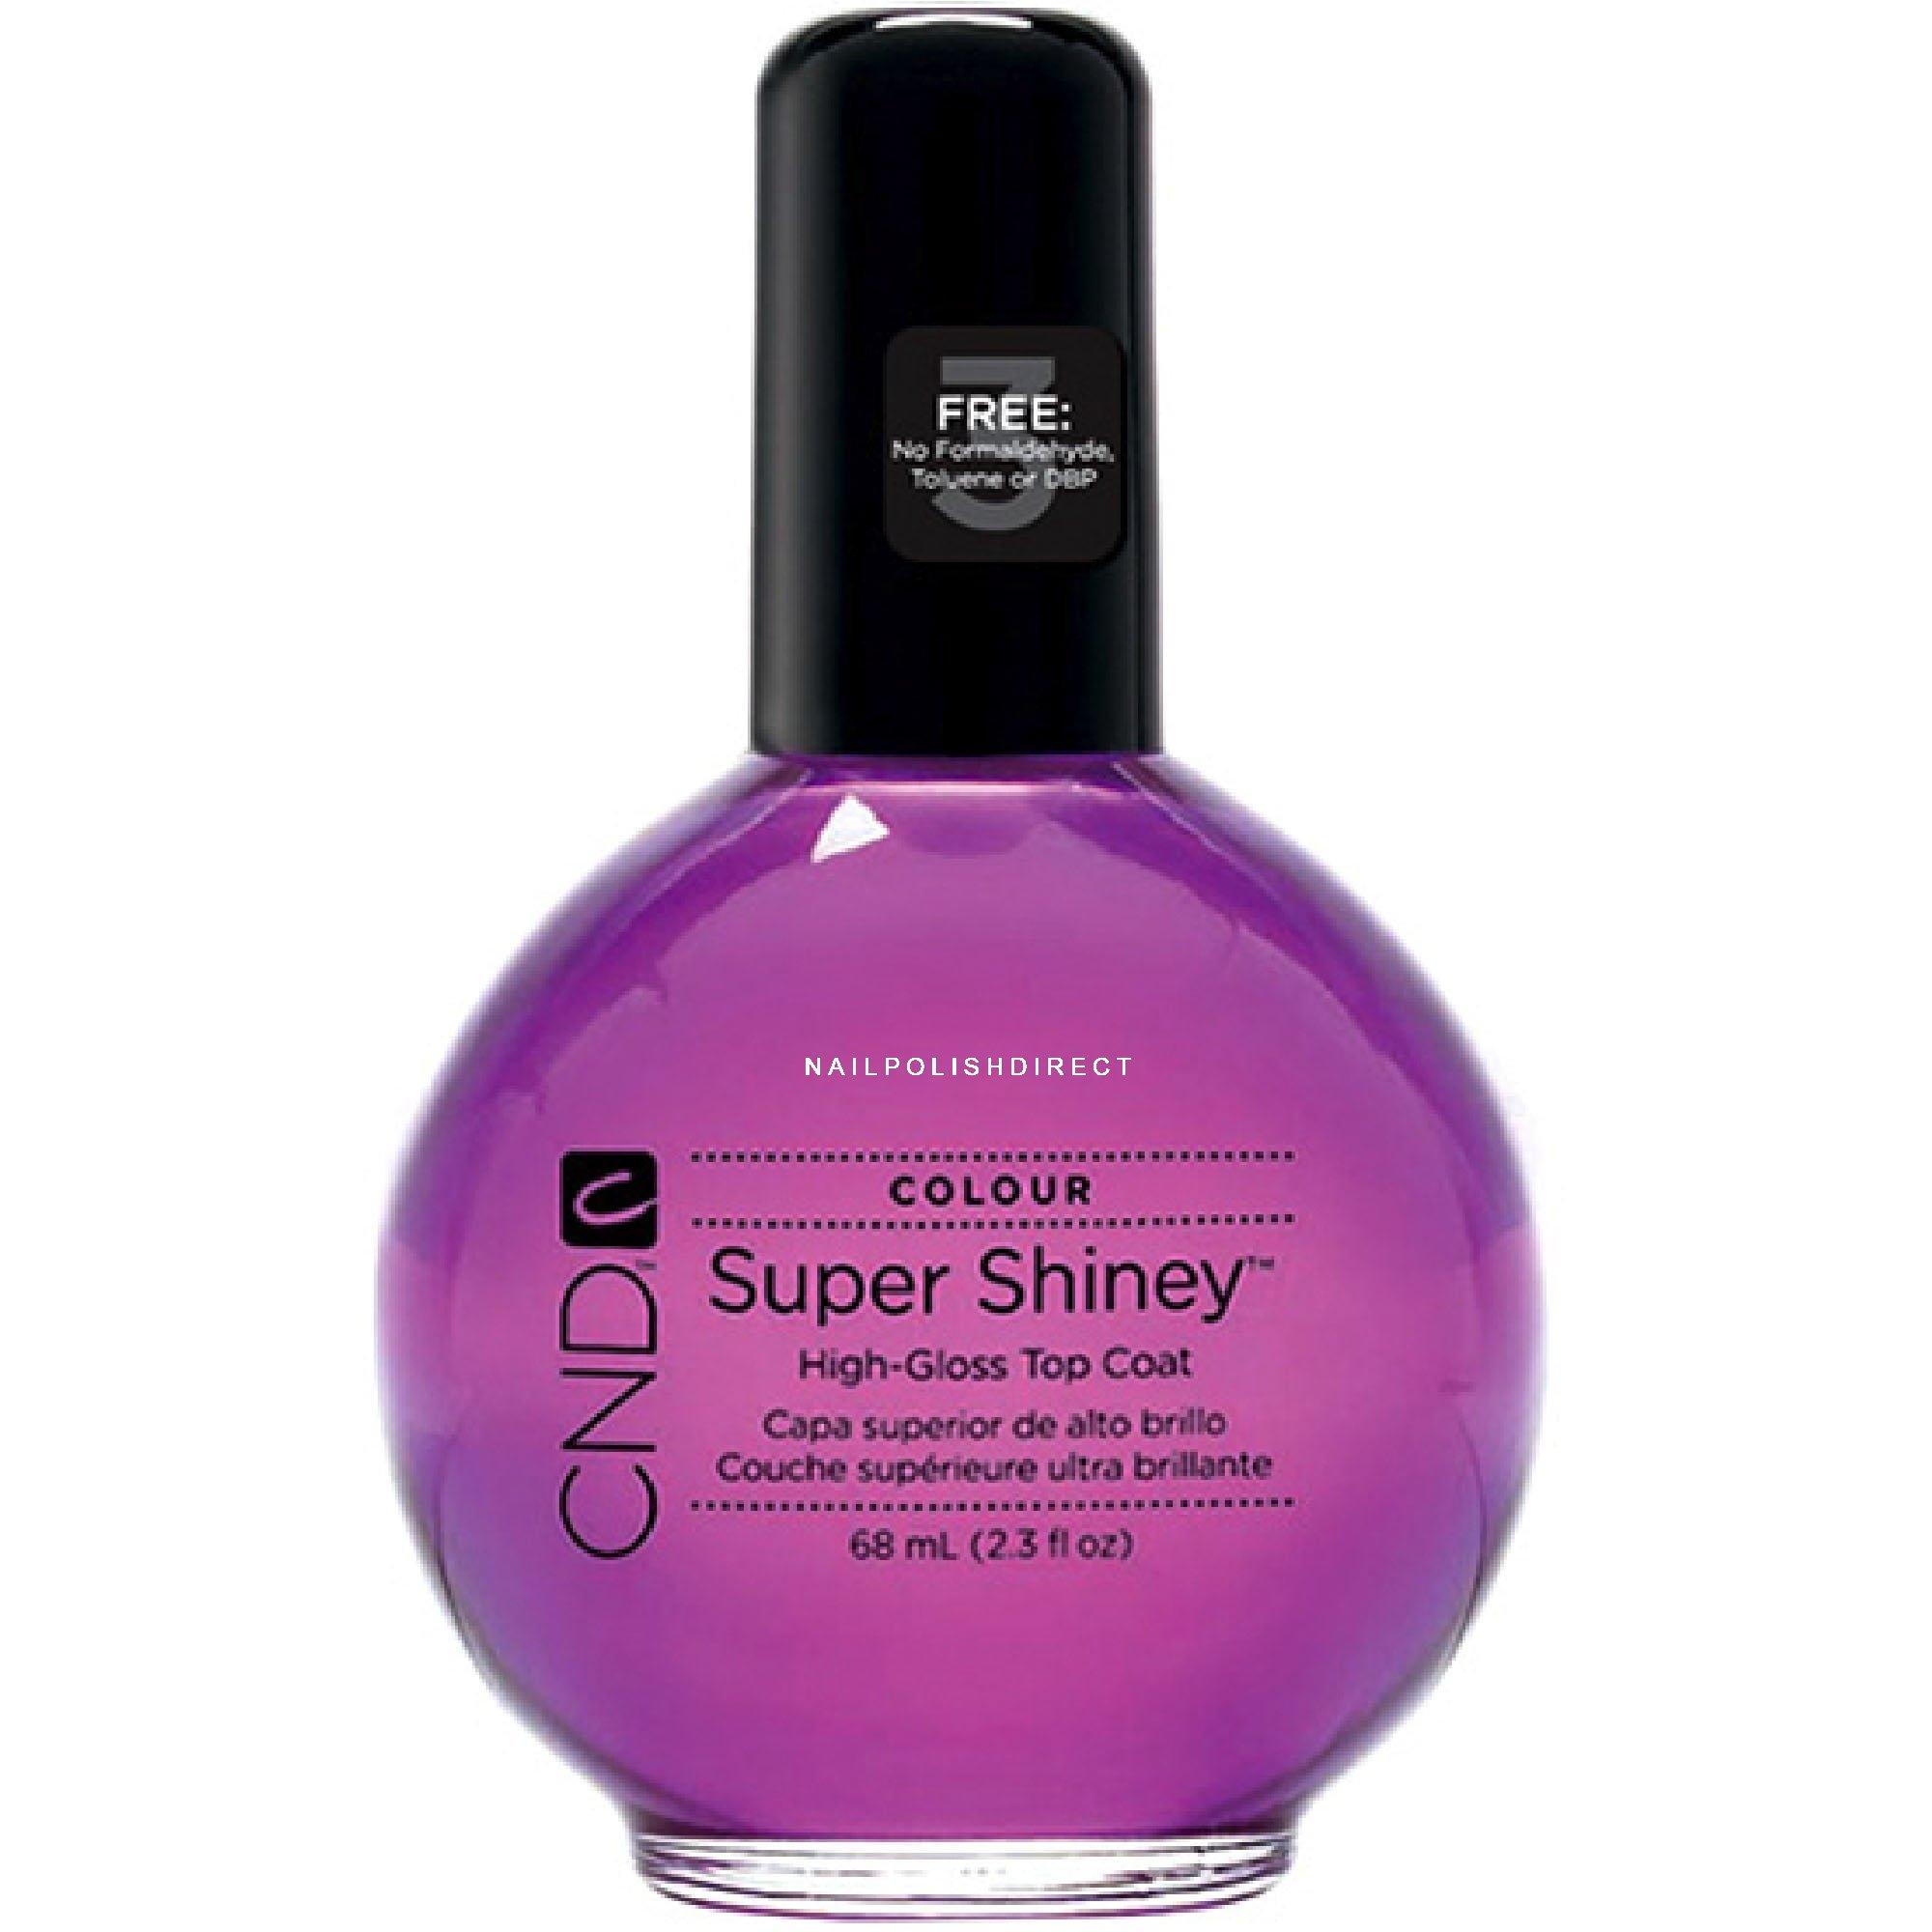 Cnd Colour Super Shiney High Gloss Top Coat 68ml